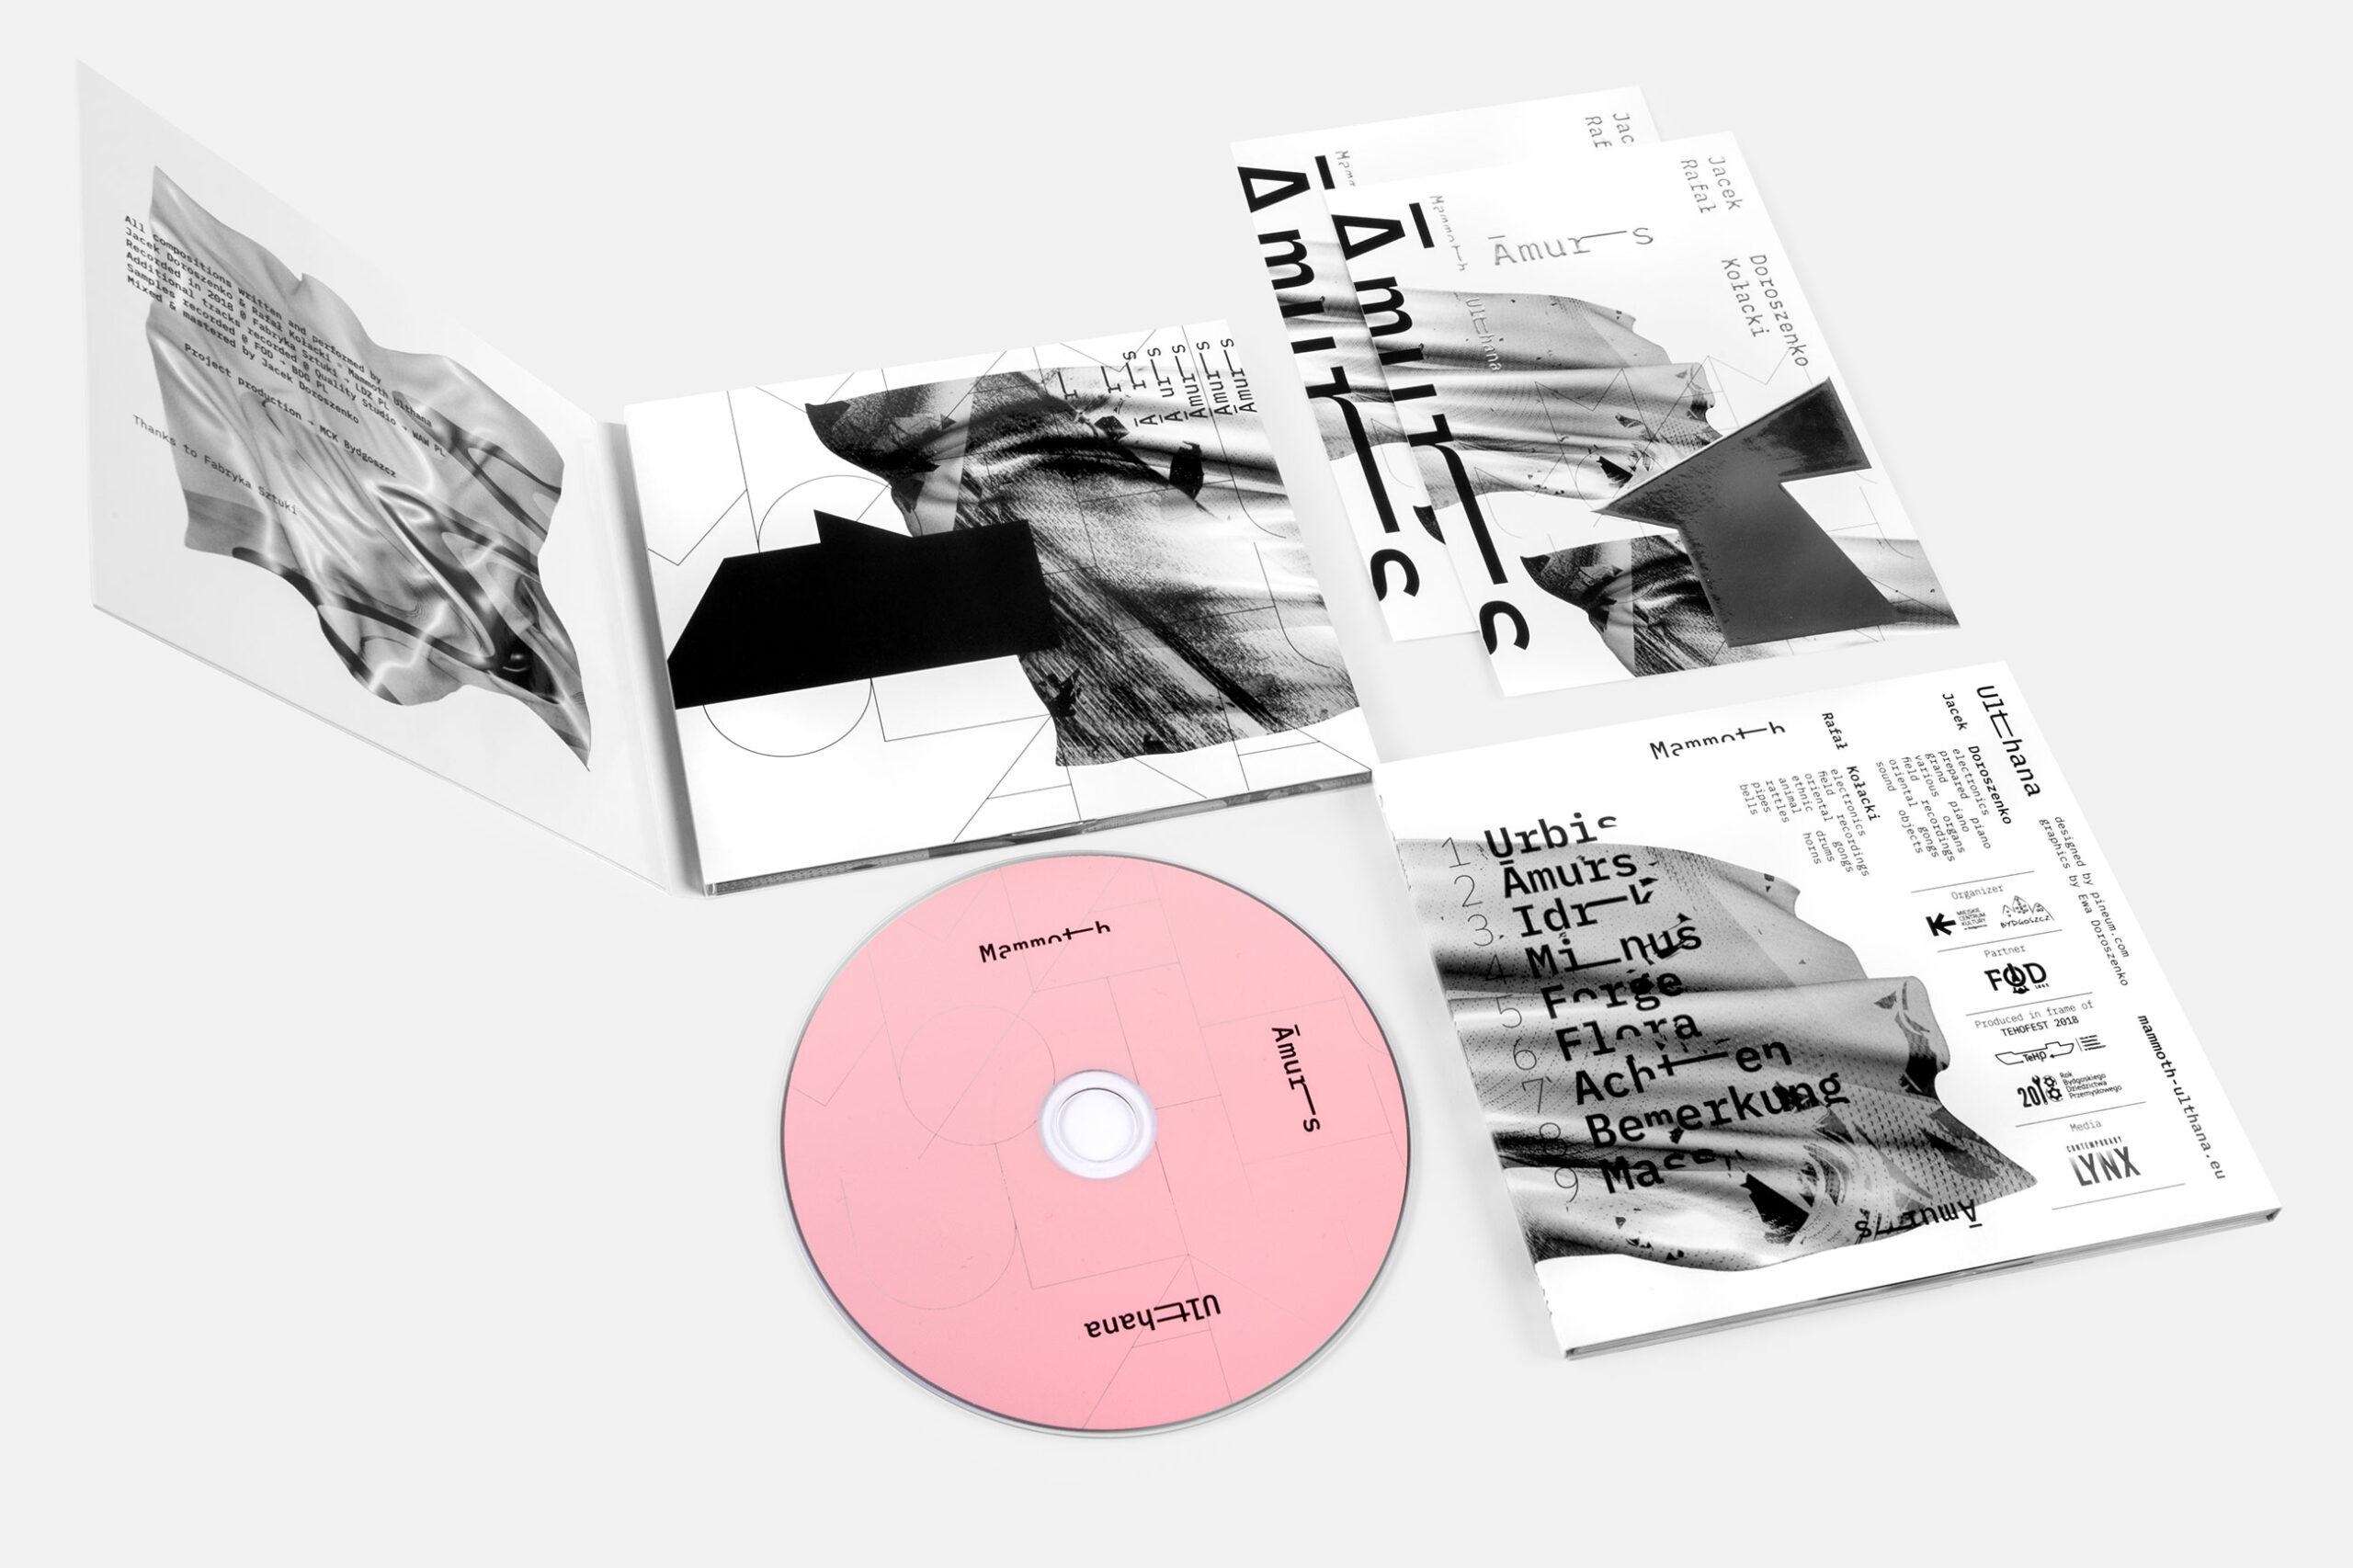 Contemporary artist Jacek Doroszenko - Amurs, music album 02